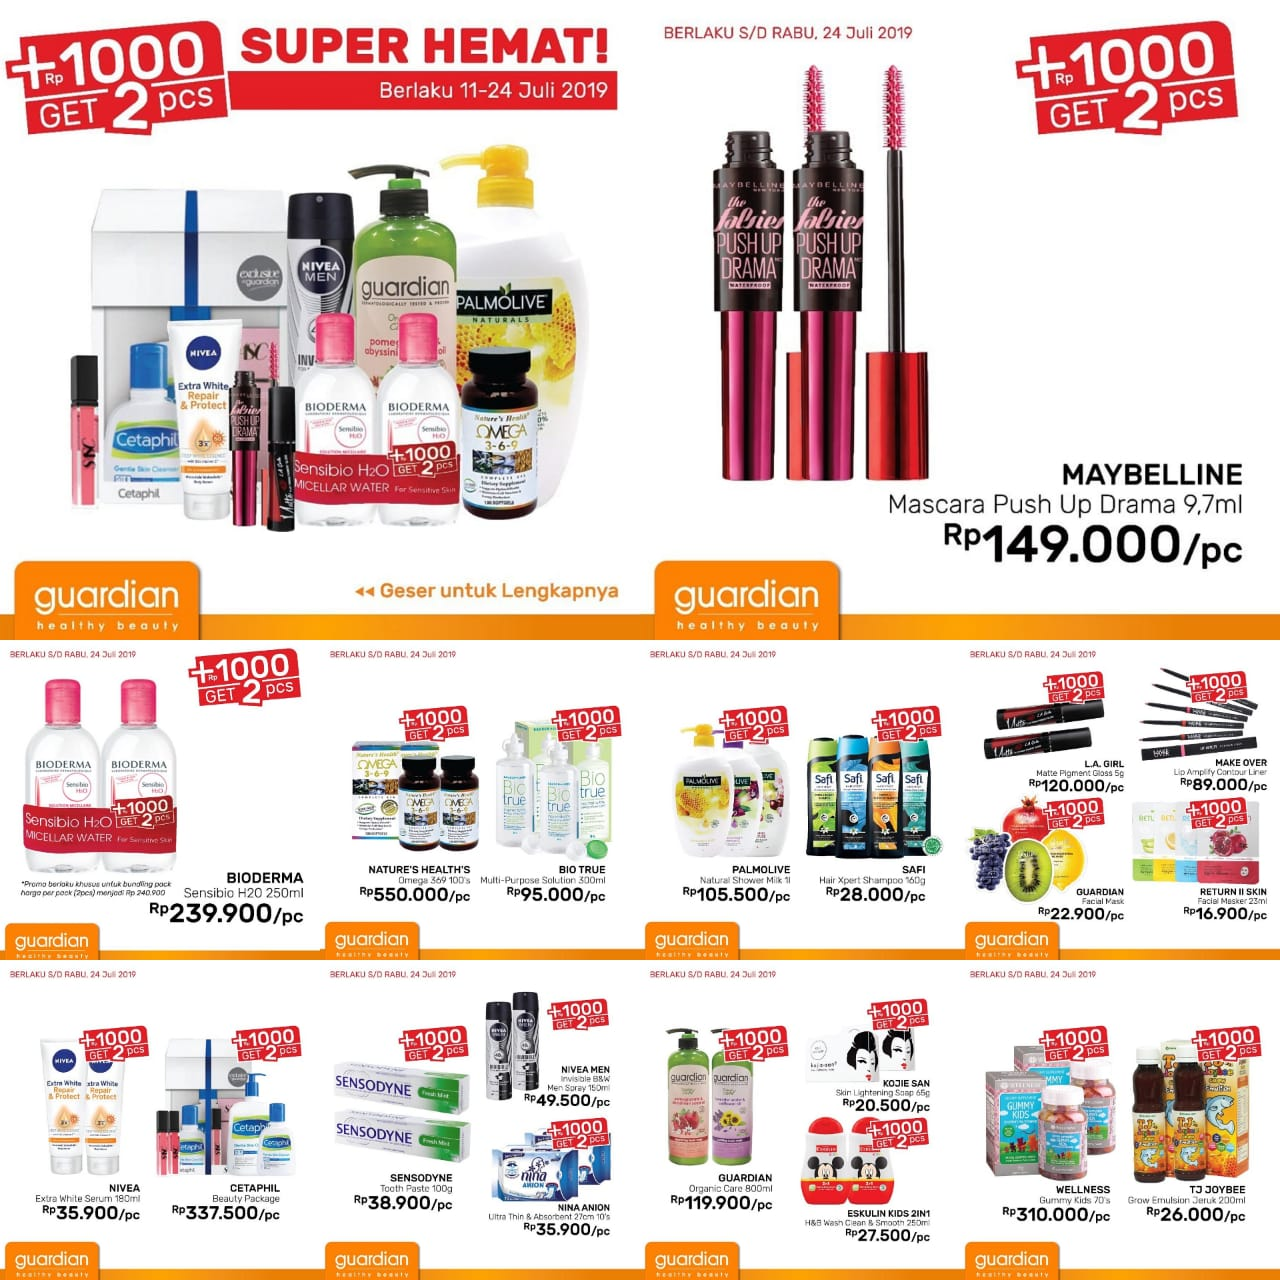 Katalog Promo Guardian Promo Rp.1.000 Dapat Dua Periode 11-24 Juli 2019